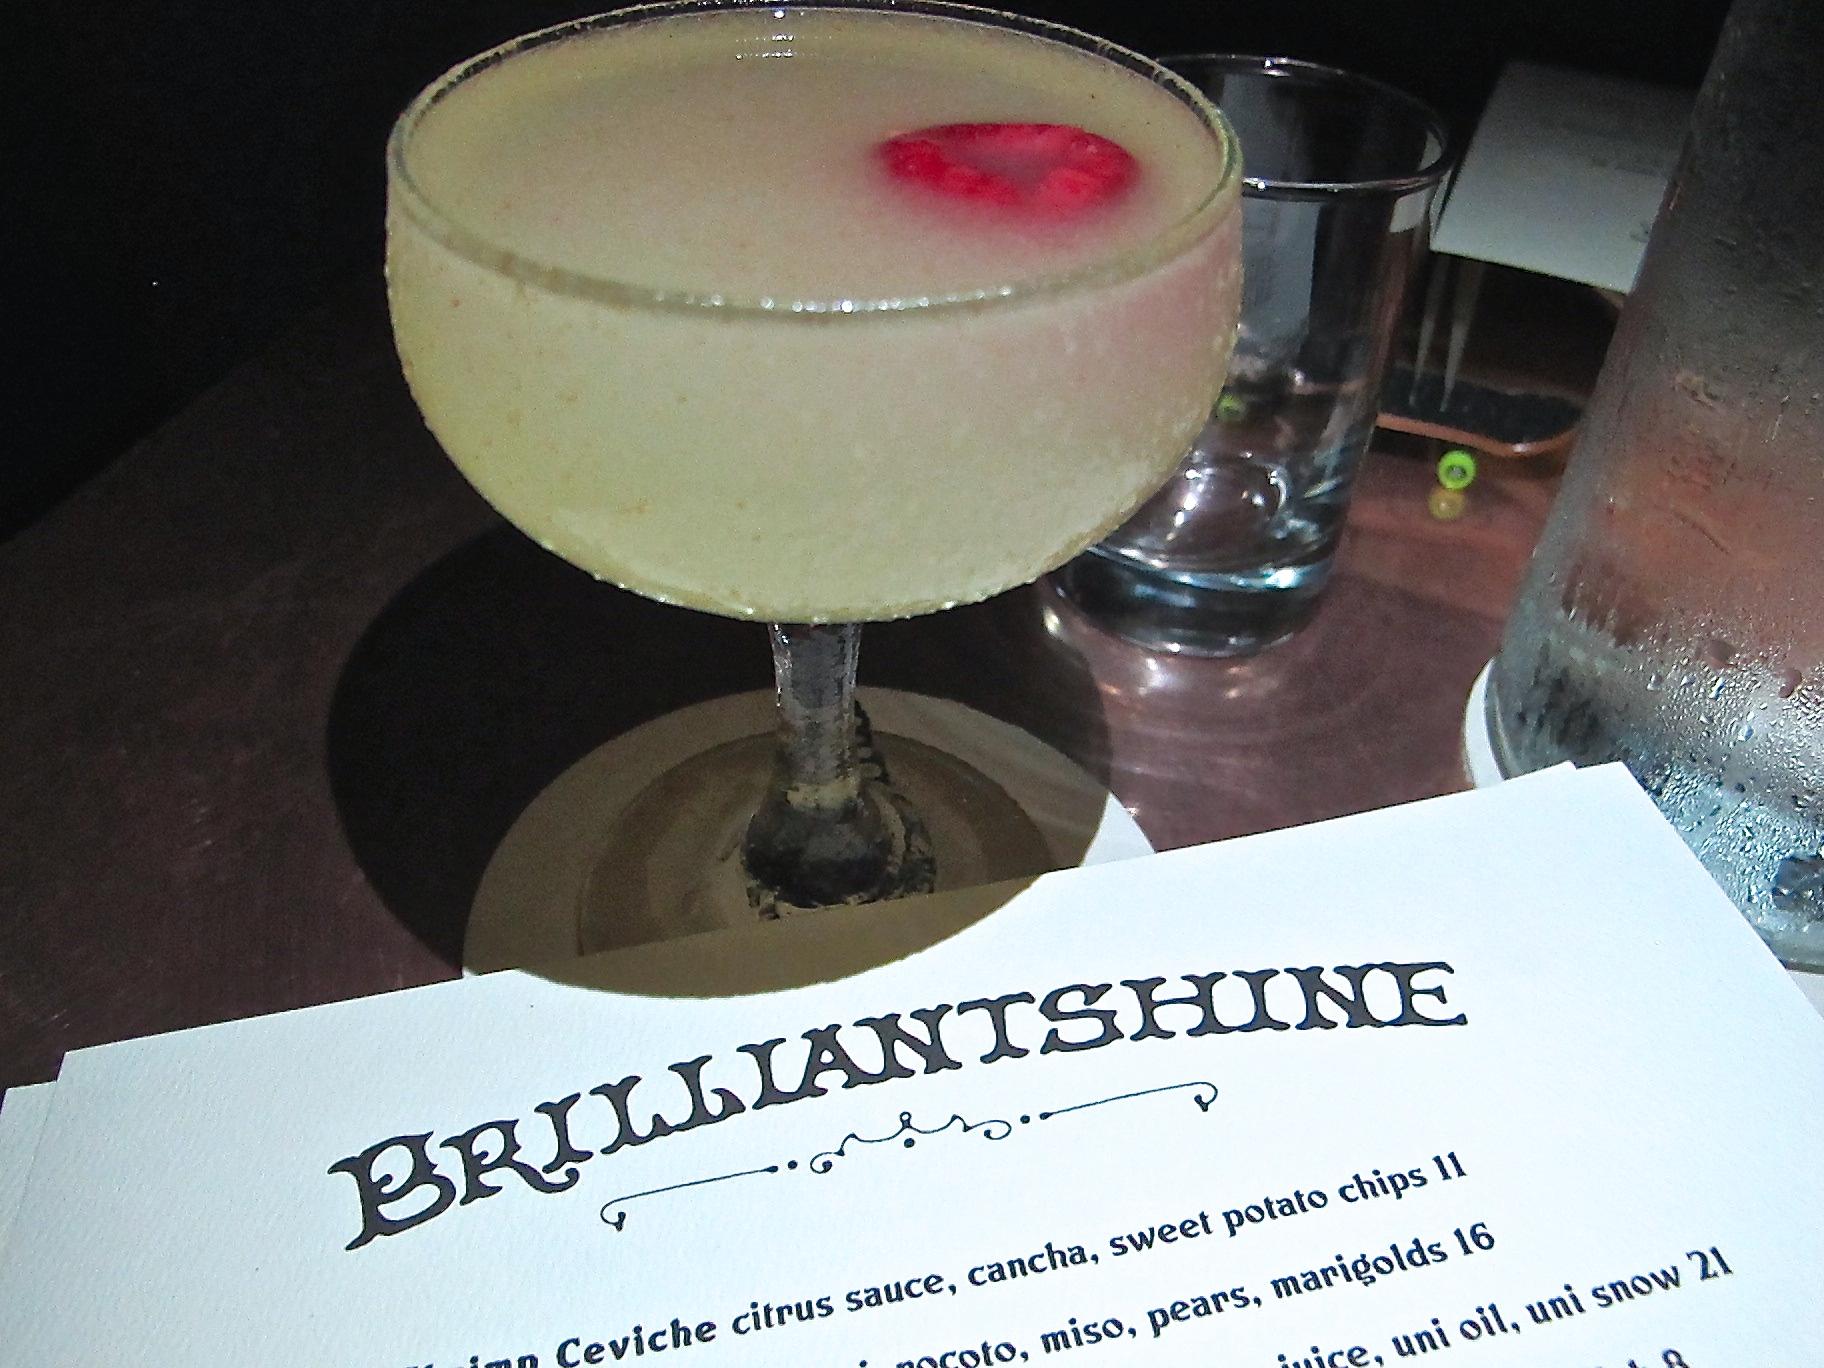 Brilliantshine cocktail